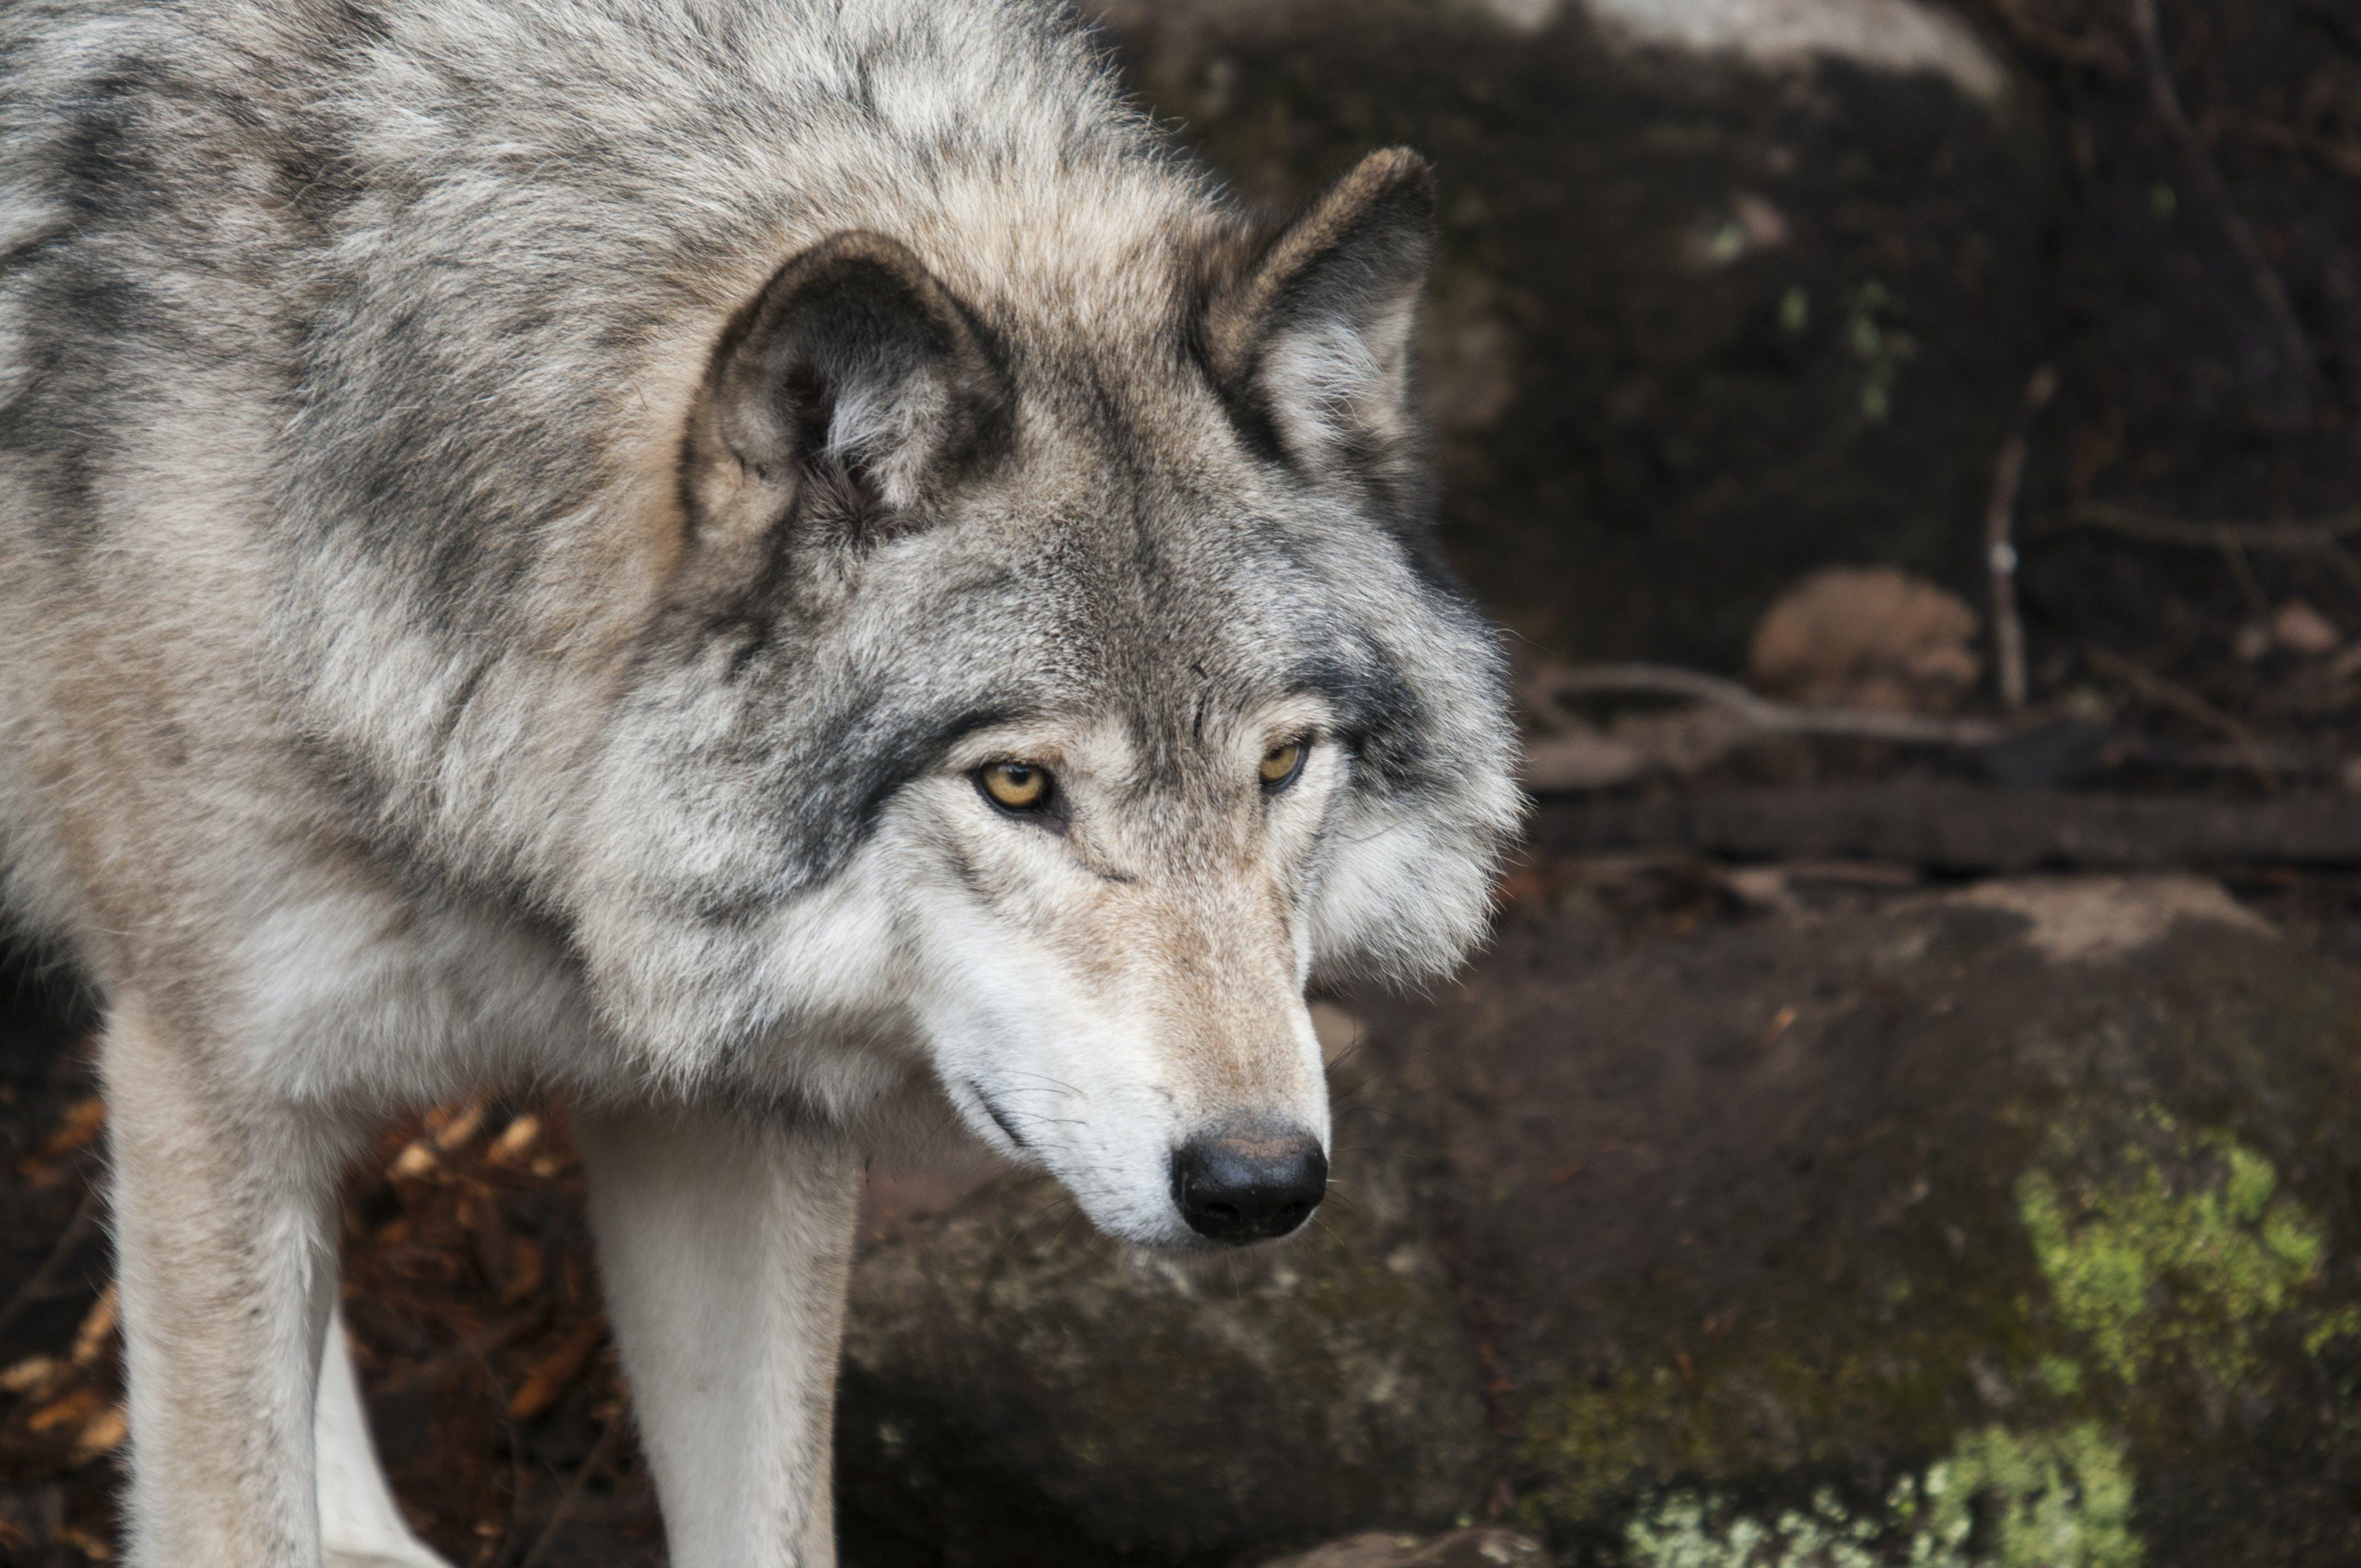 animal, animal photography, blur